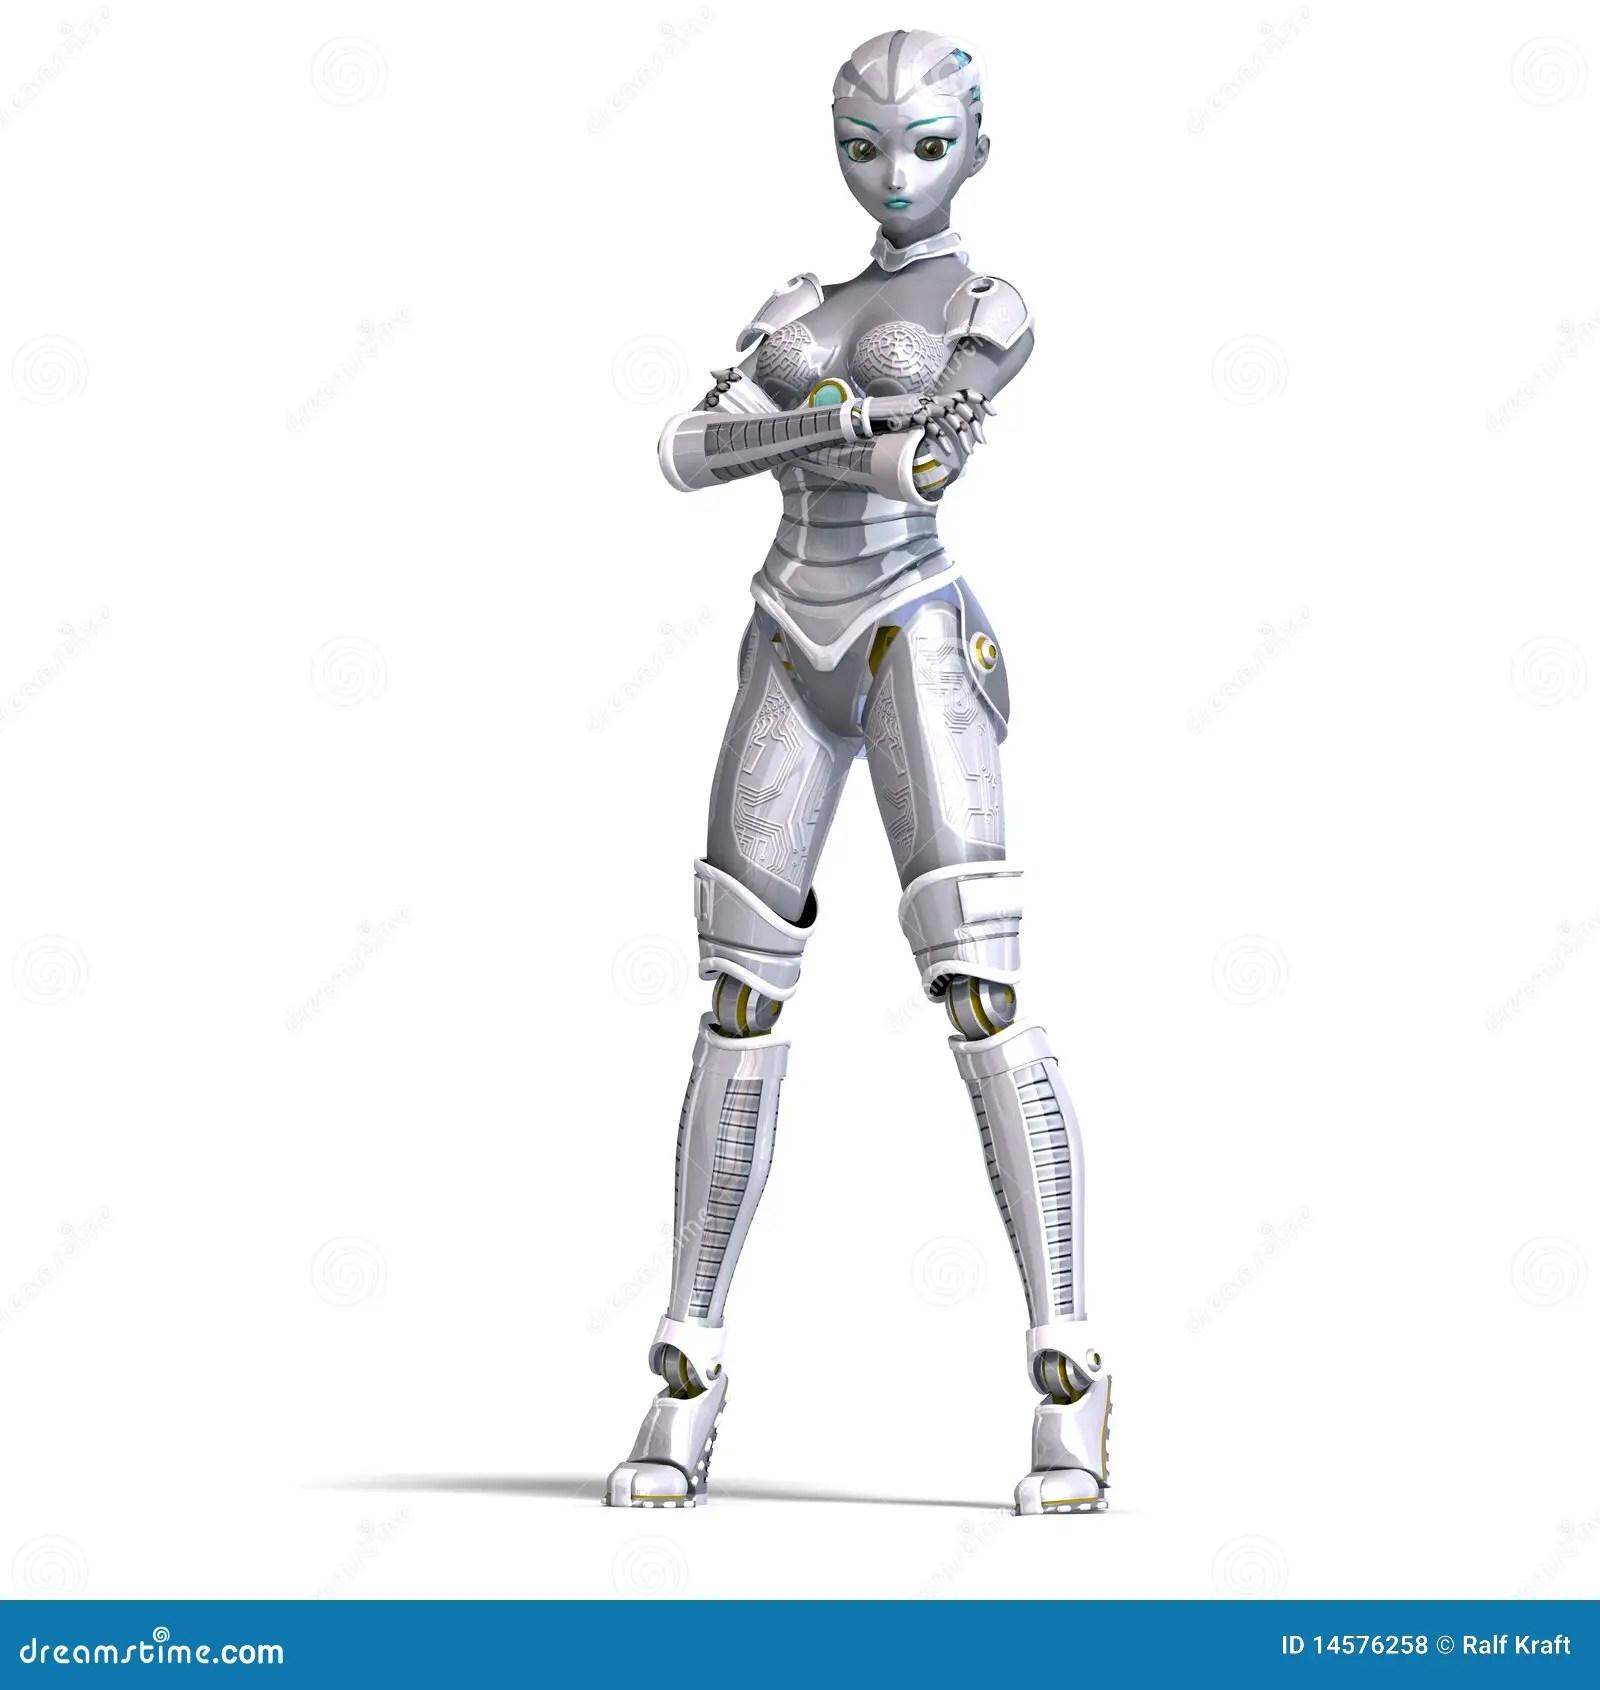 Female Metallic Robot 3d Rendering With Stock